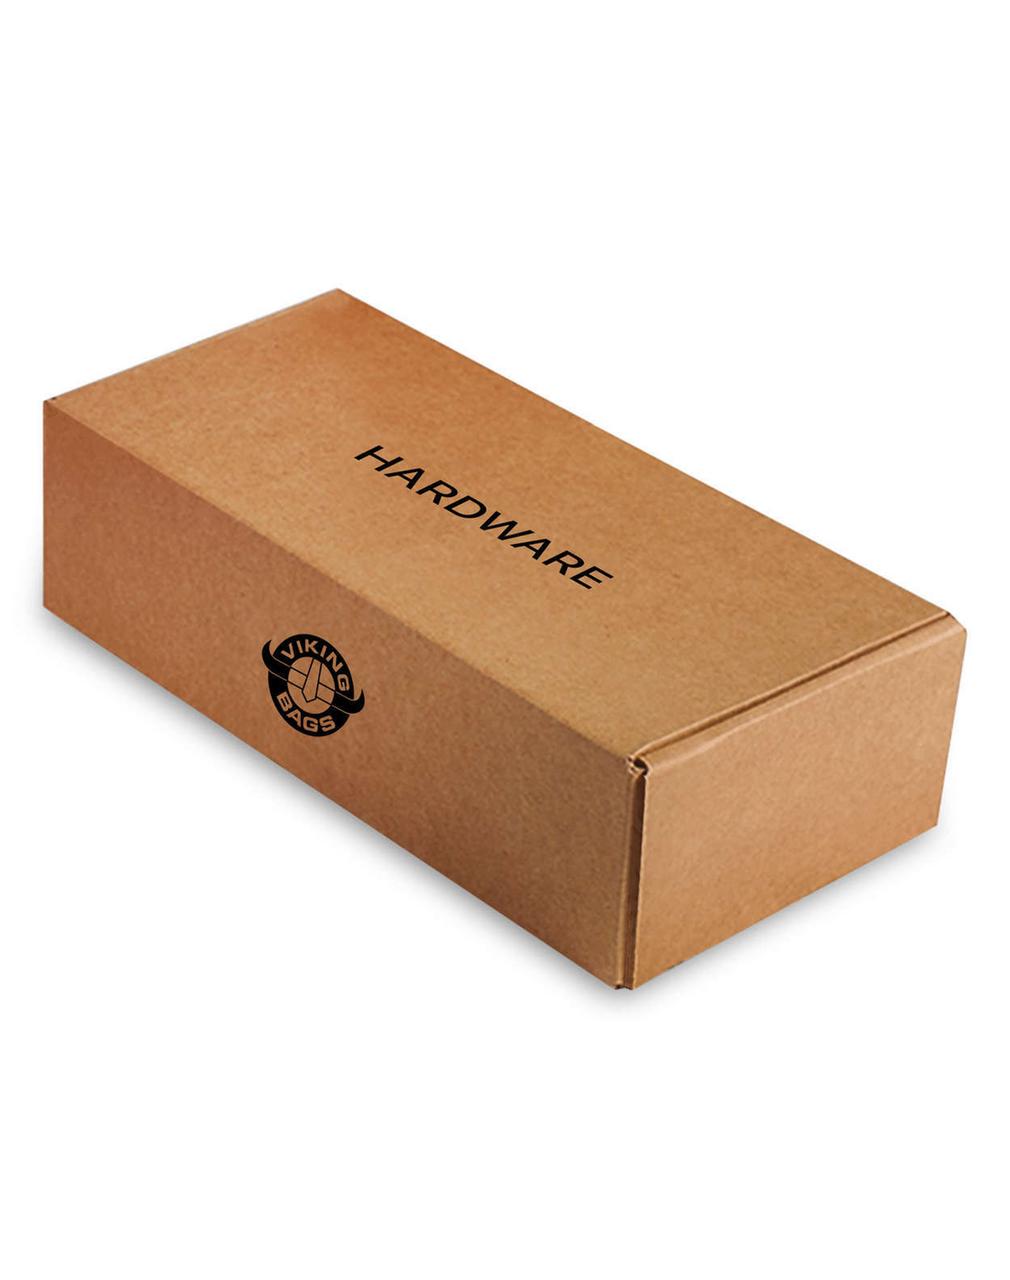 Honda 1100 Shadow Aero SS Side Pocket Studded Motorcycle Saddlebags Box